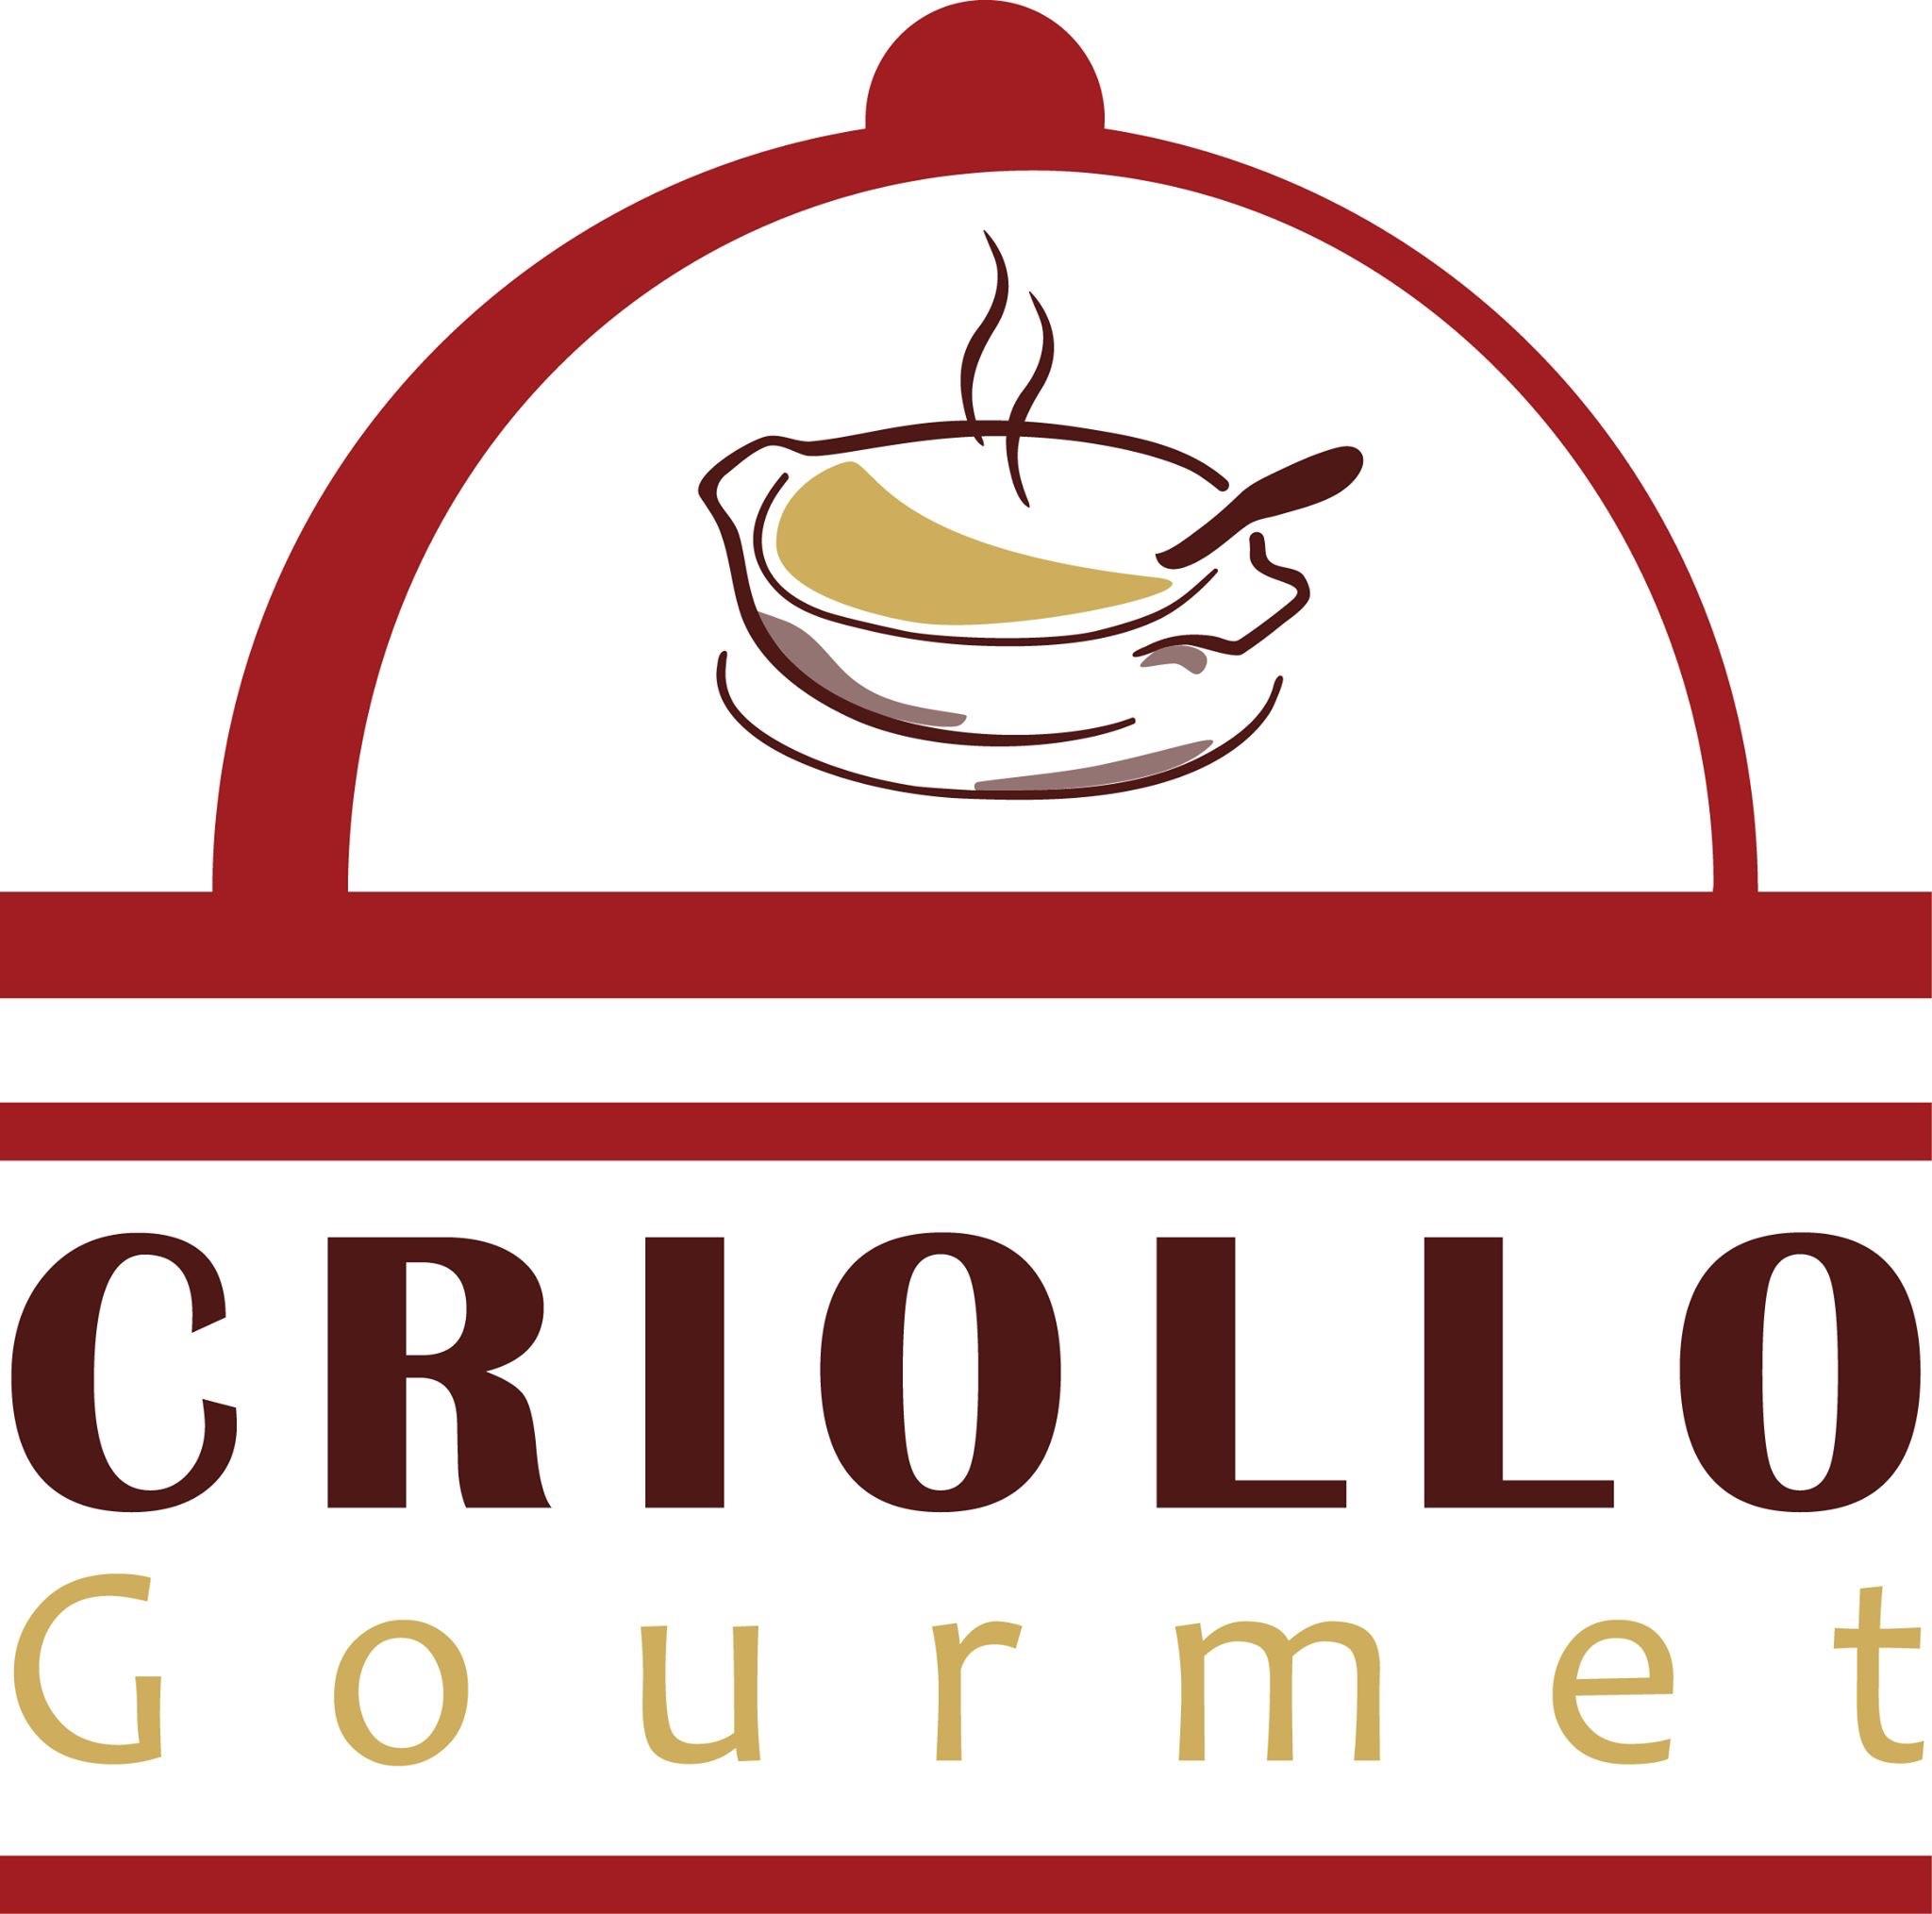 EL CRIOLLO GOURMET RESTAURANT Macul